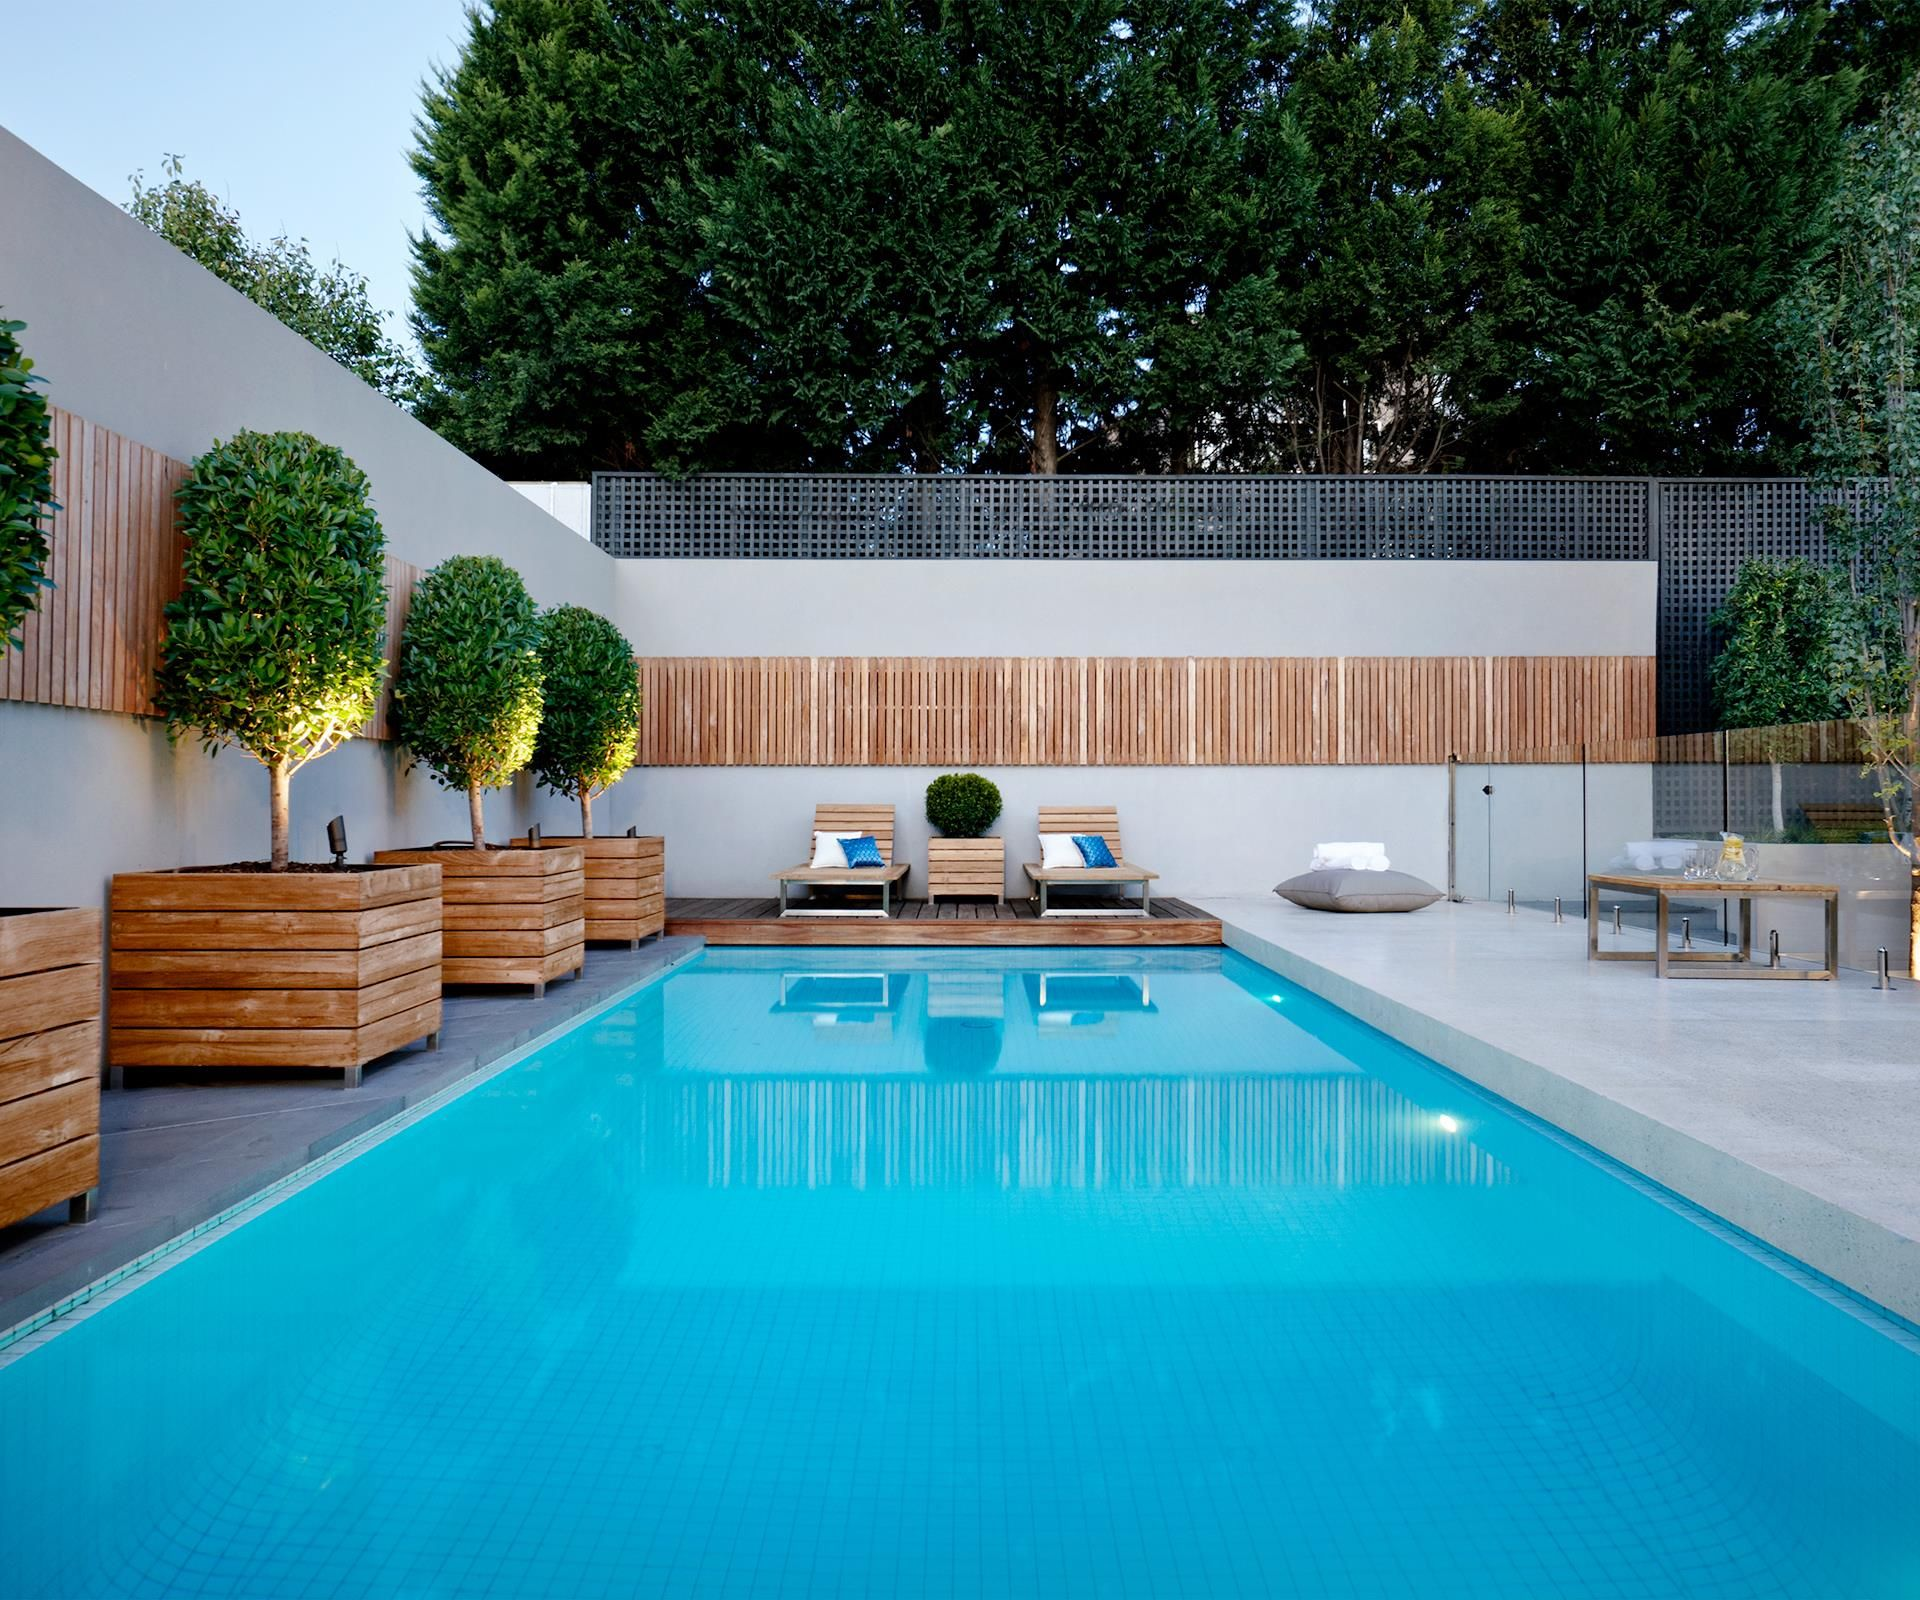 Best Residential Concrete Pool Under $50,000 Sunbreaker Swimming Pools &